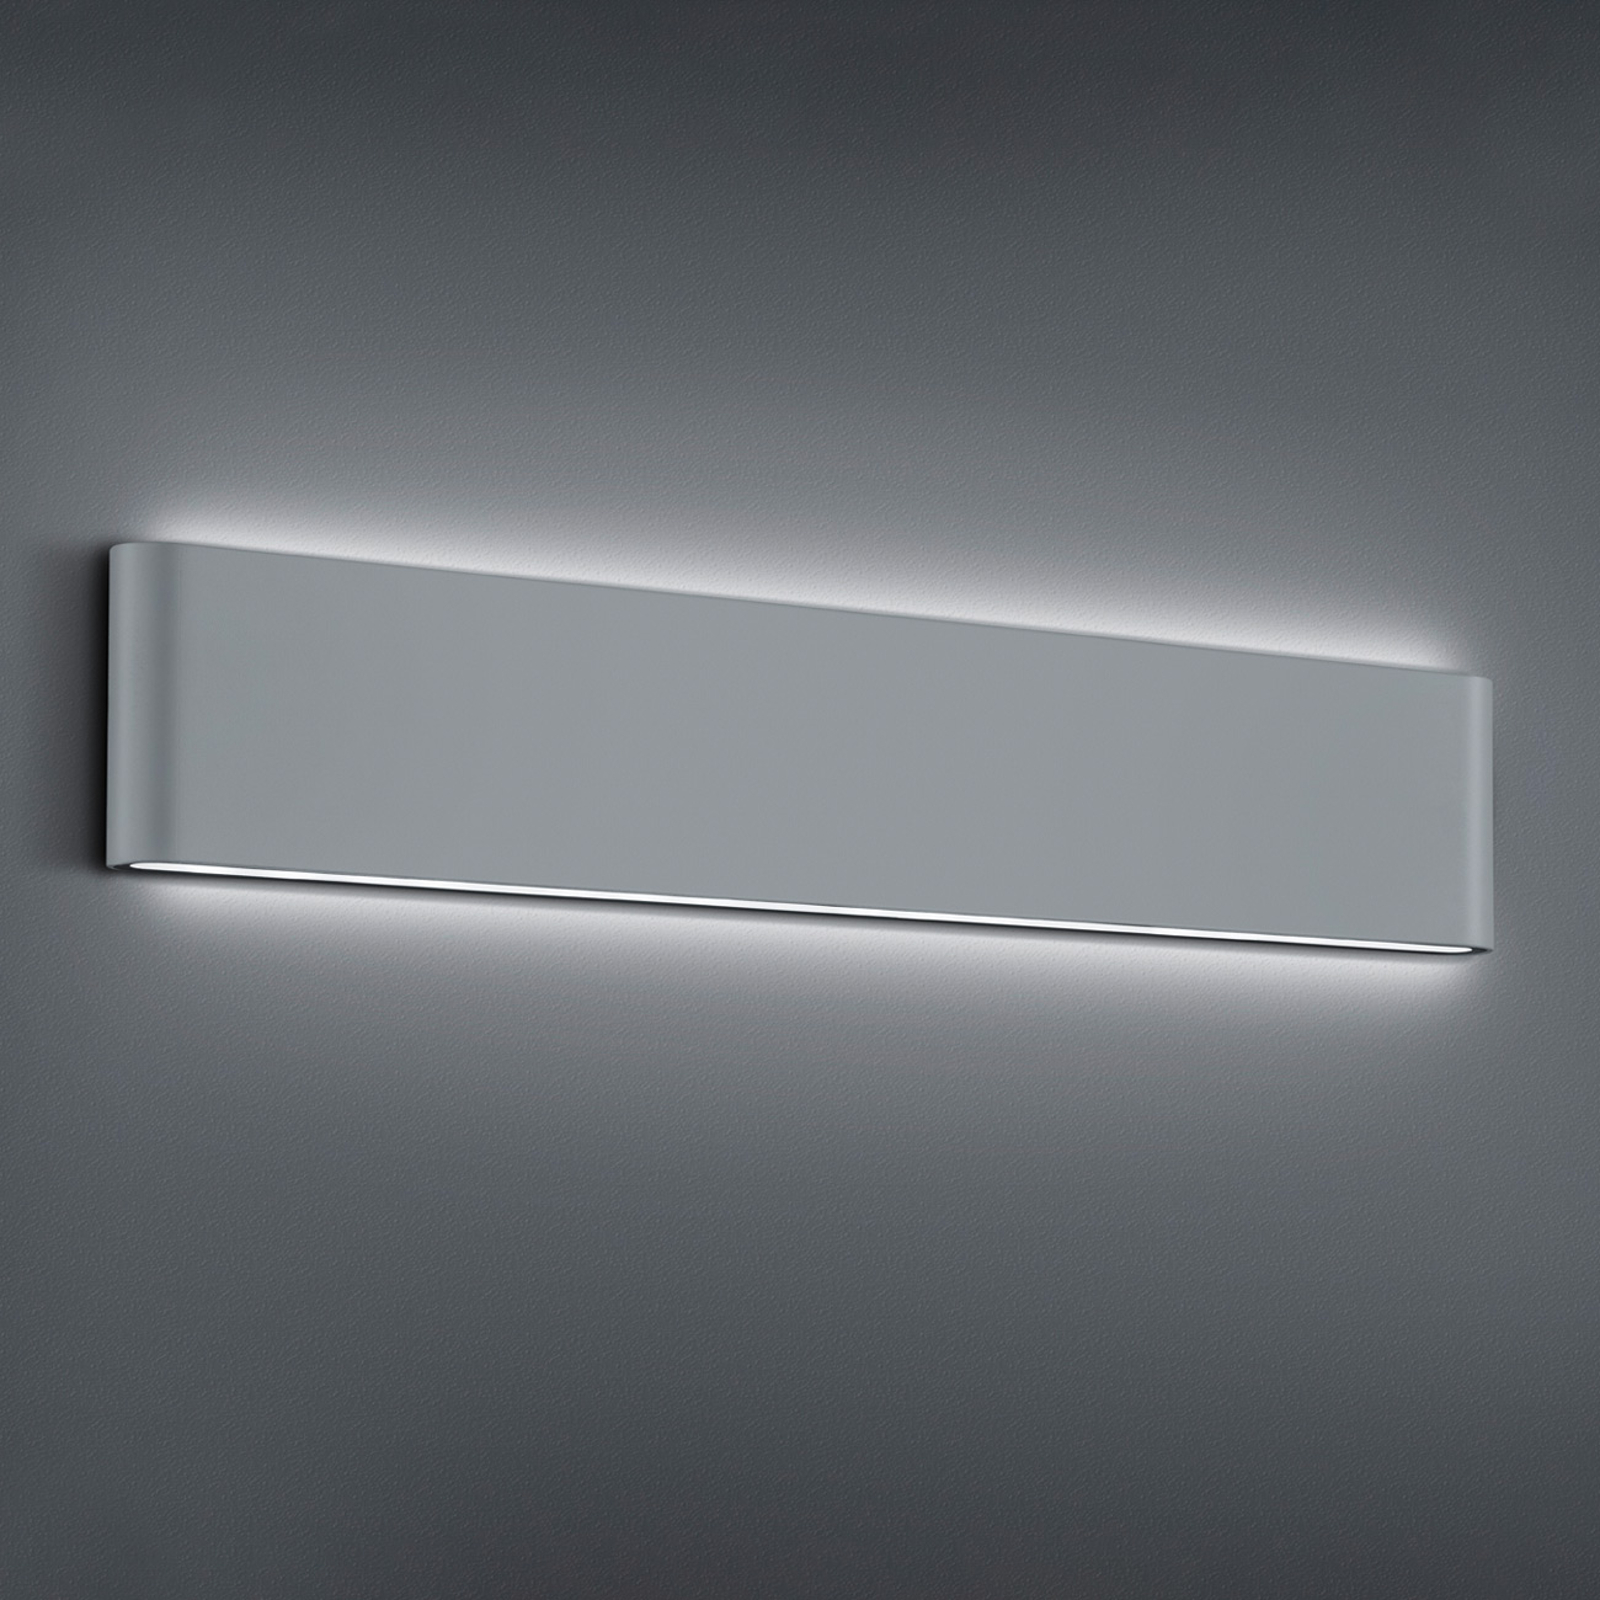 LED buitenwandlamp Thames II, titaniumkleuren